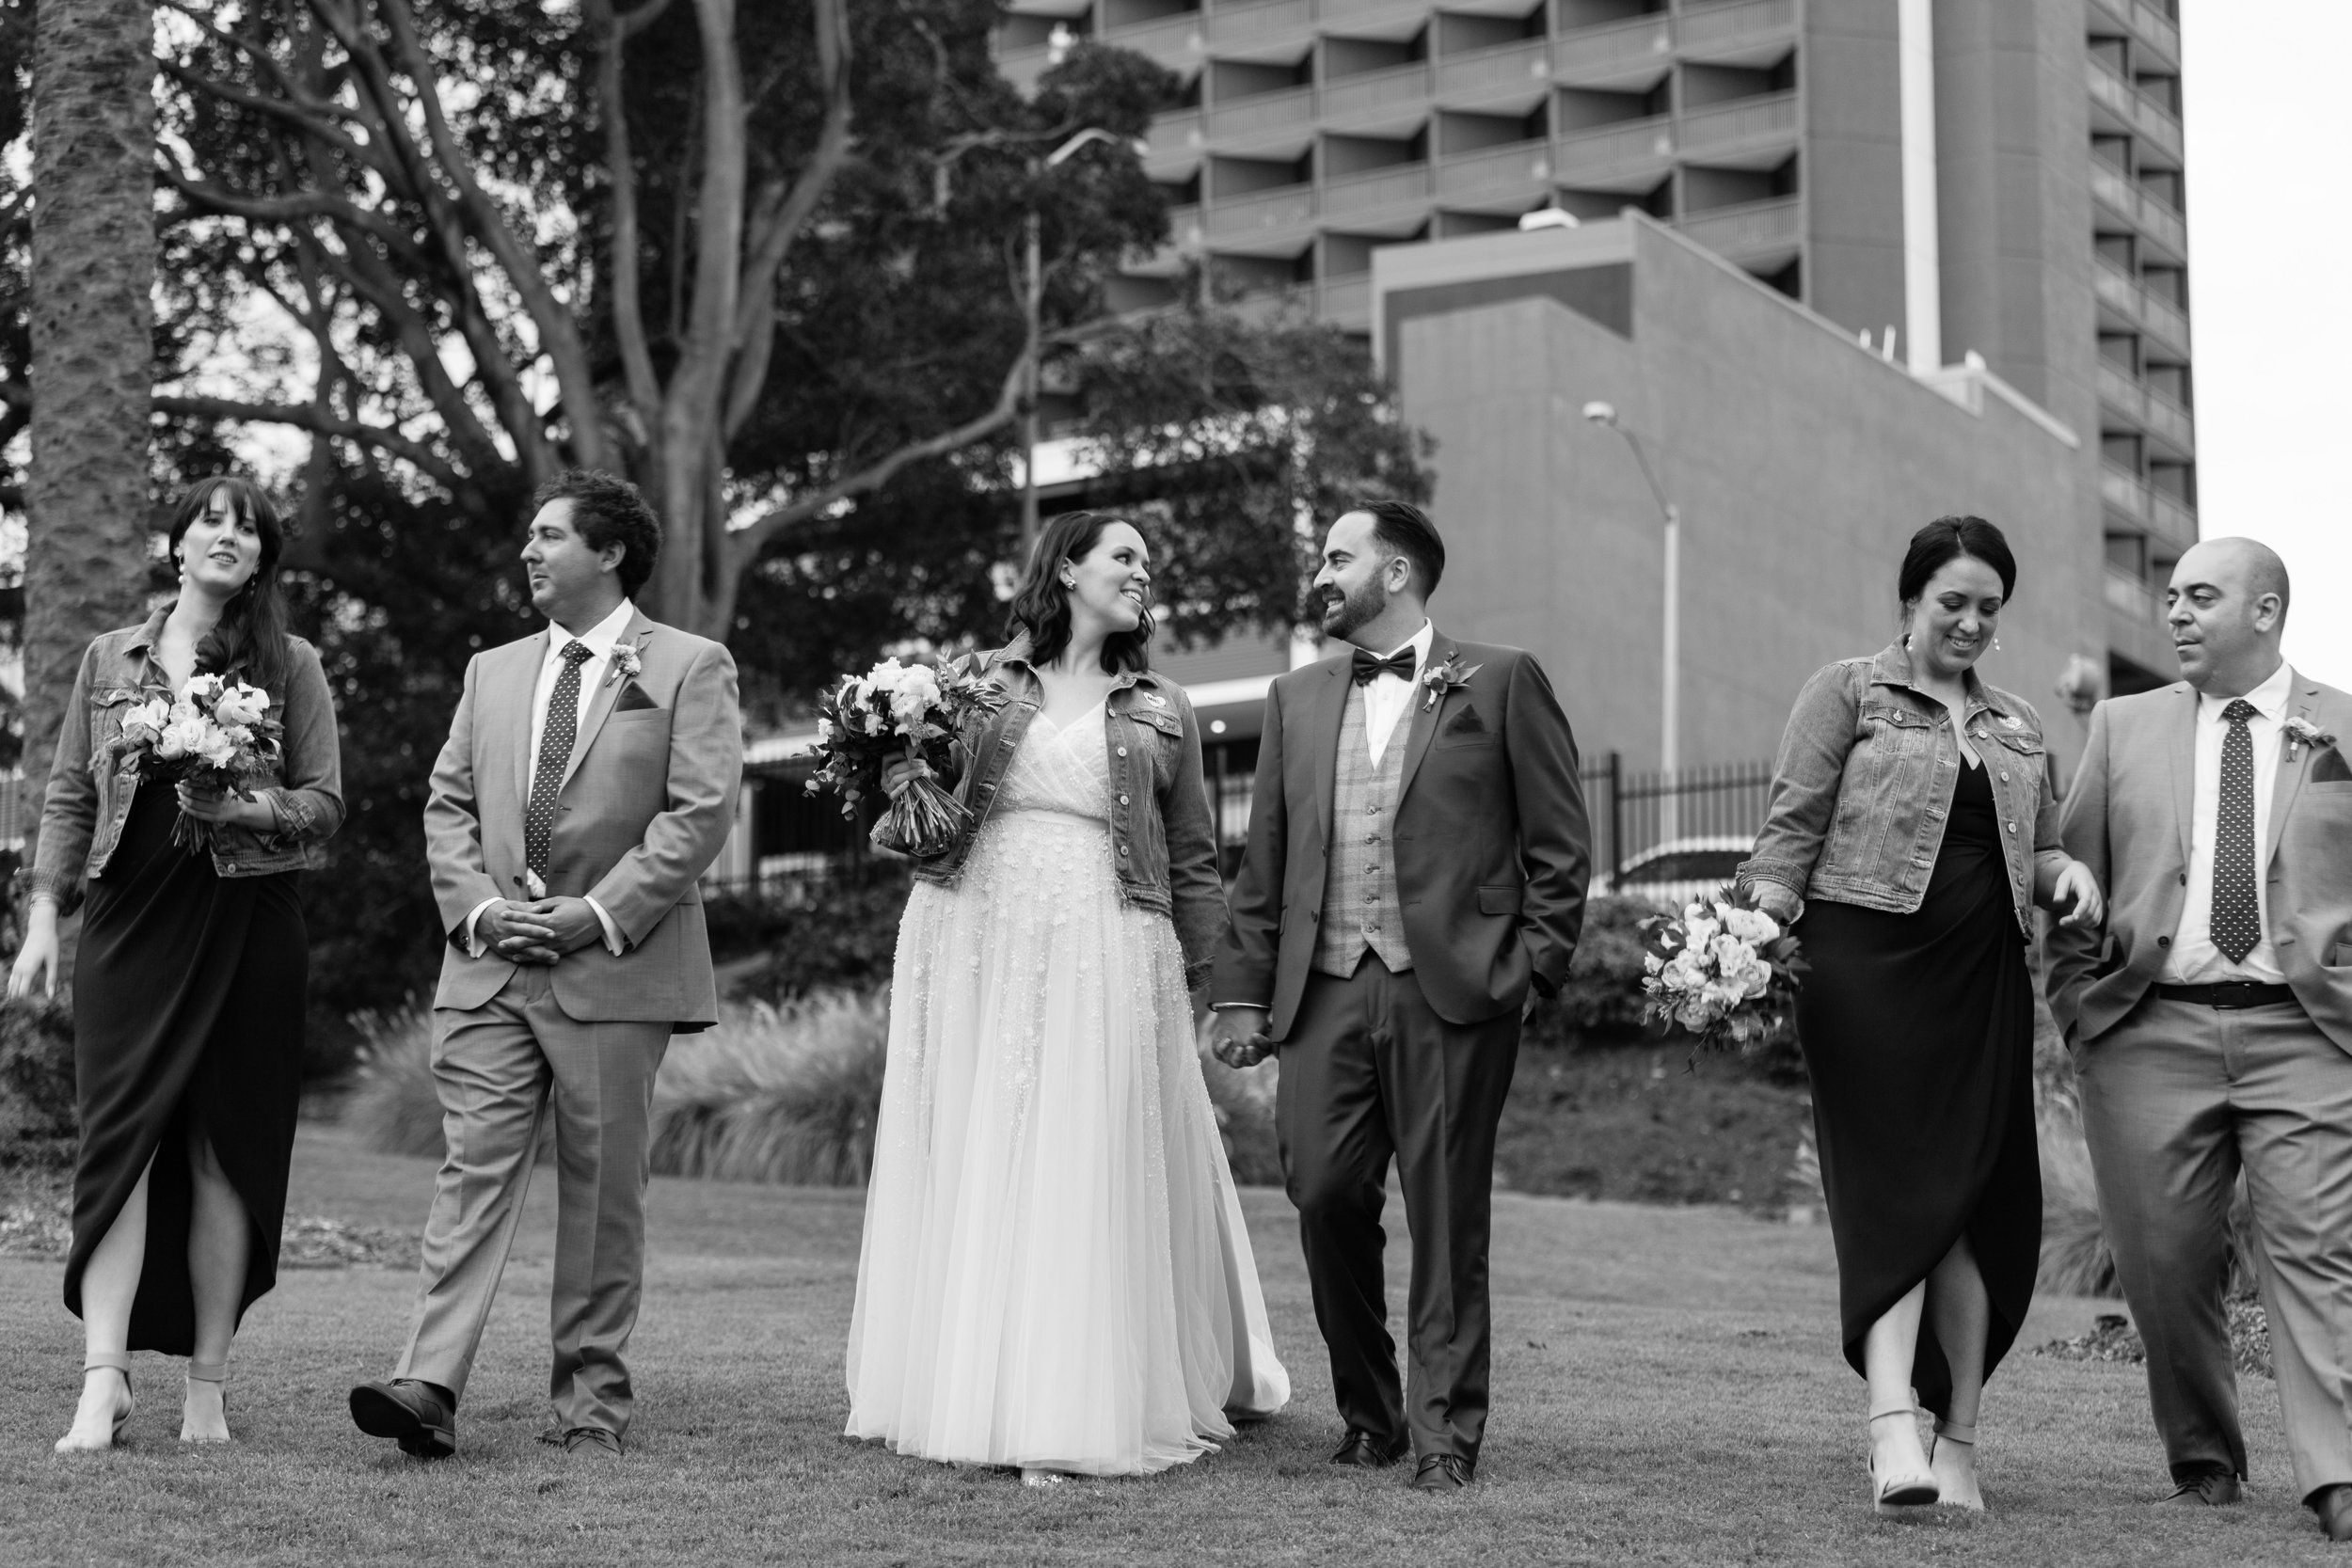 brisbane-city-wedding-photographer-romantic-wedding-70.jpg